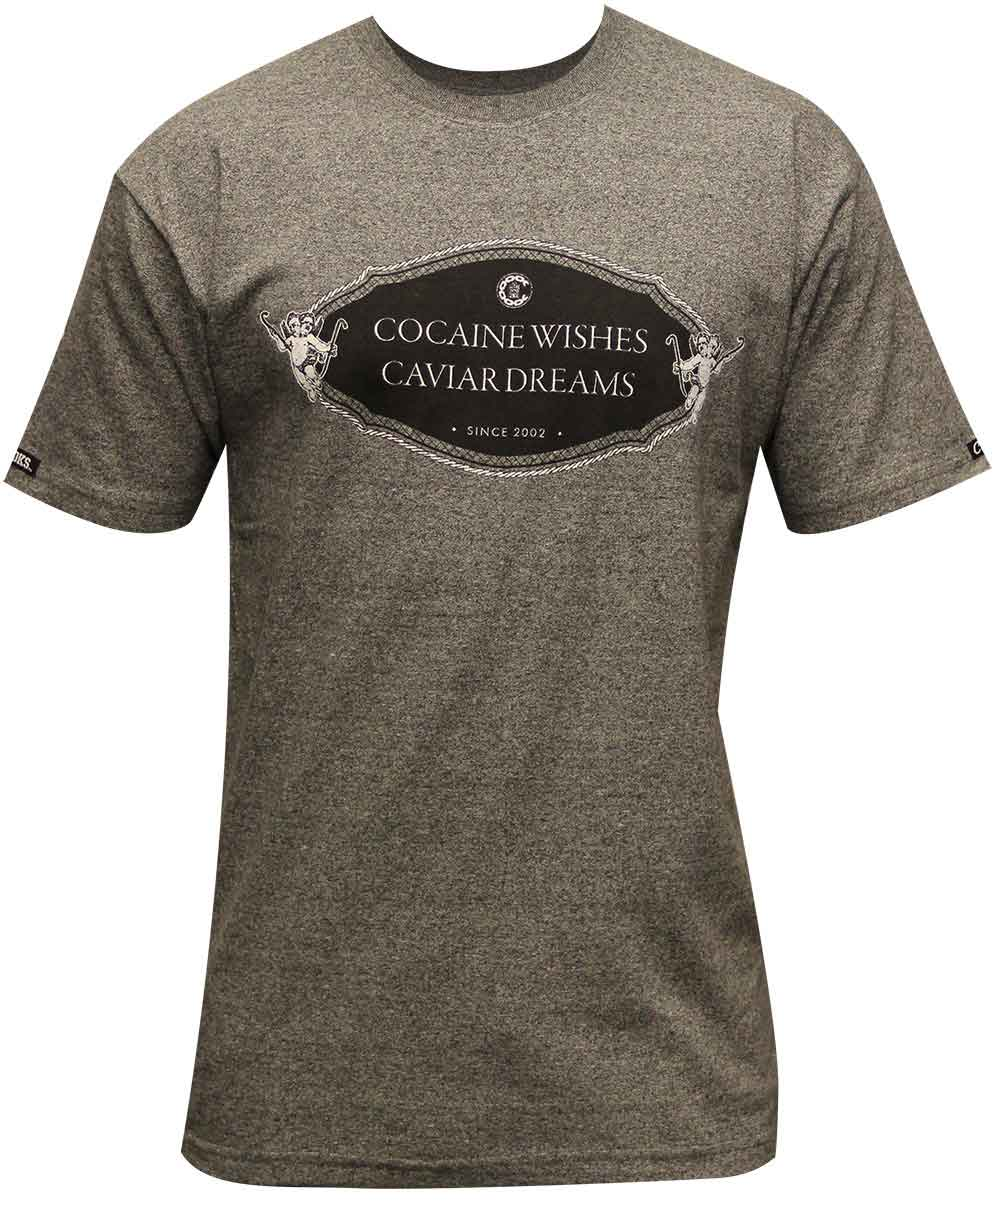 Crooks & Castles Rich And Shameless T-Shirt Speckle Black